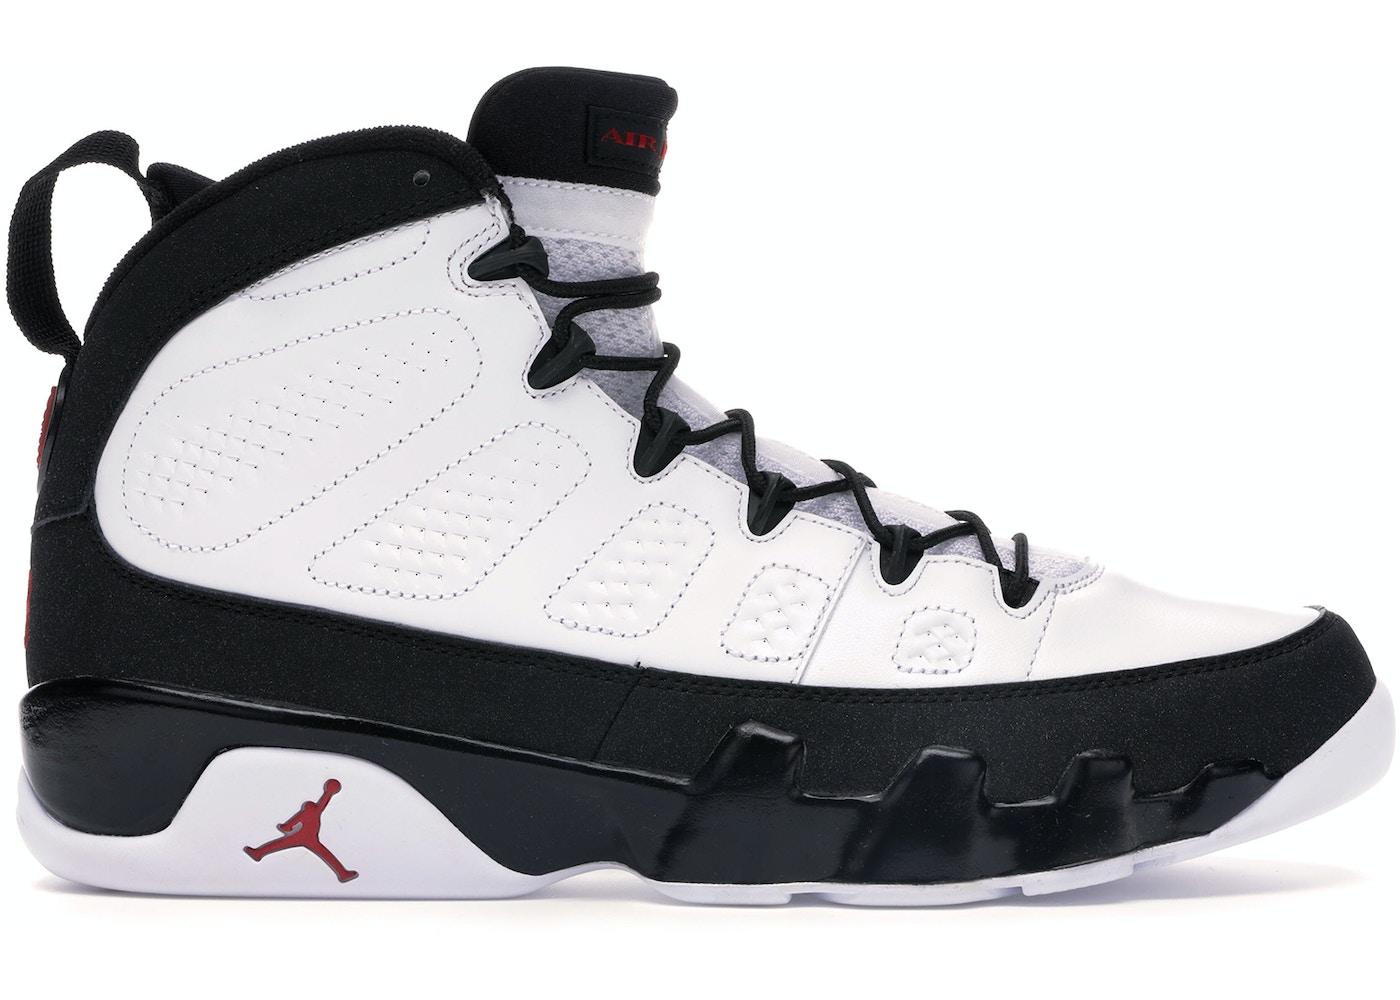 innovative design fdc11 5a14e Jordan 9 Retro White Black Red (2010)